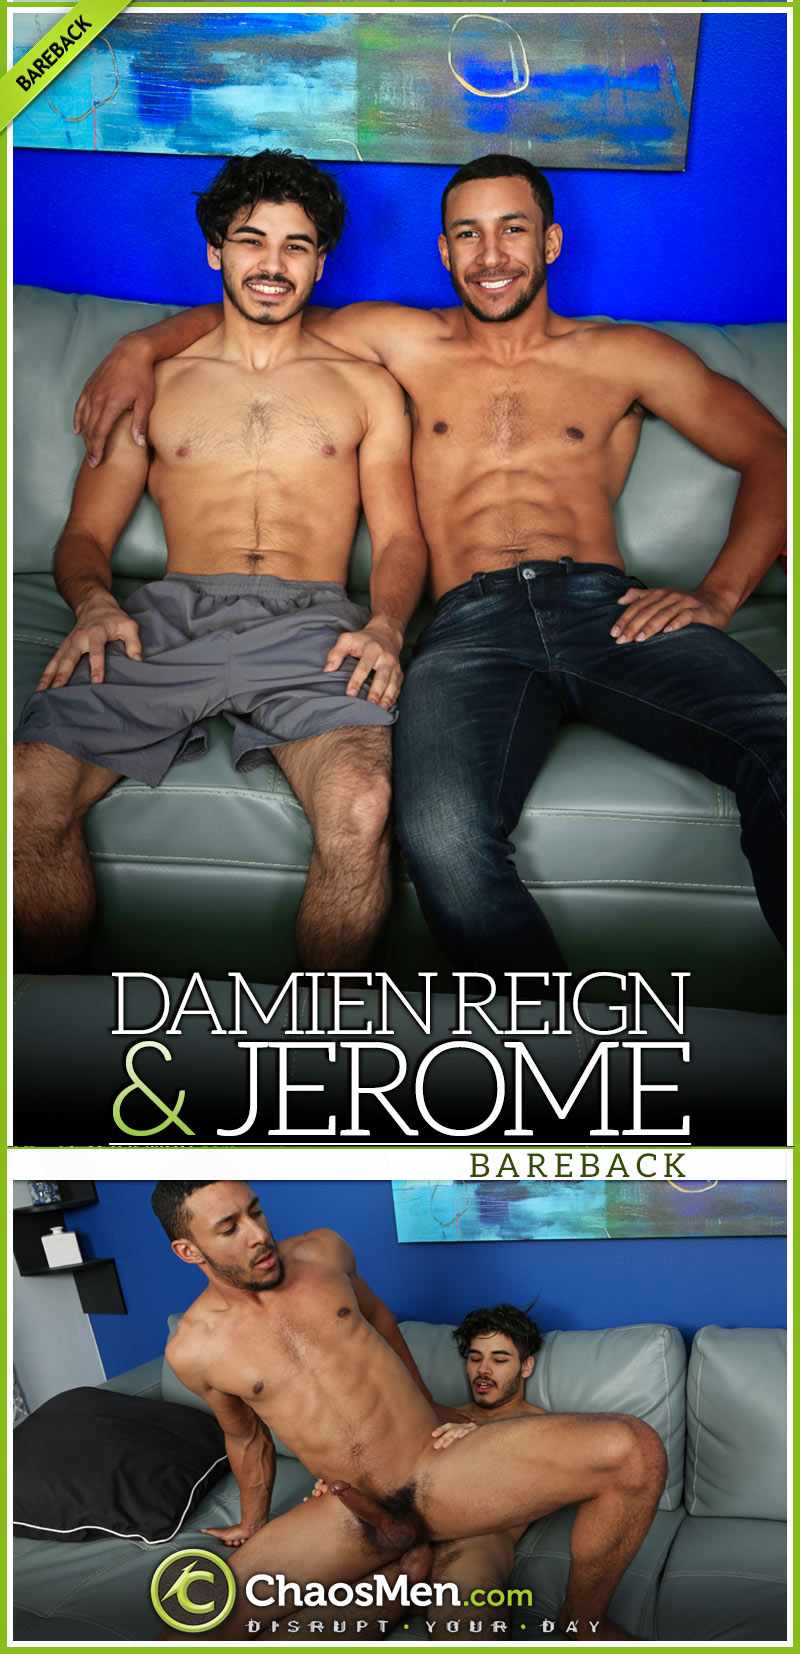 Damien Reign Fucks Jerome (Bareback) at ChaosMen